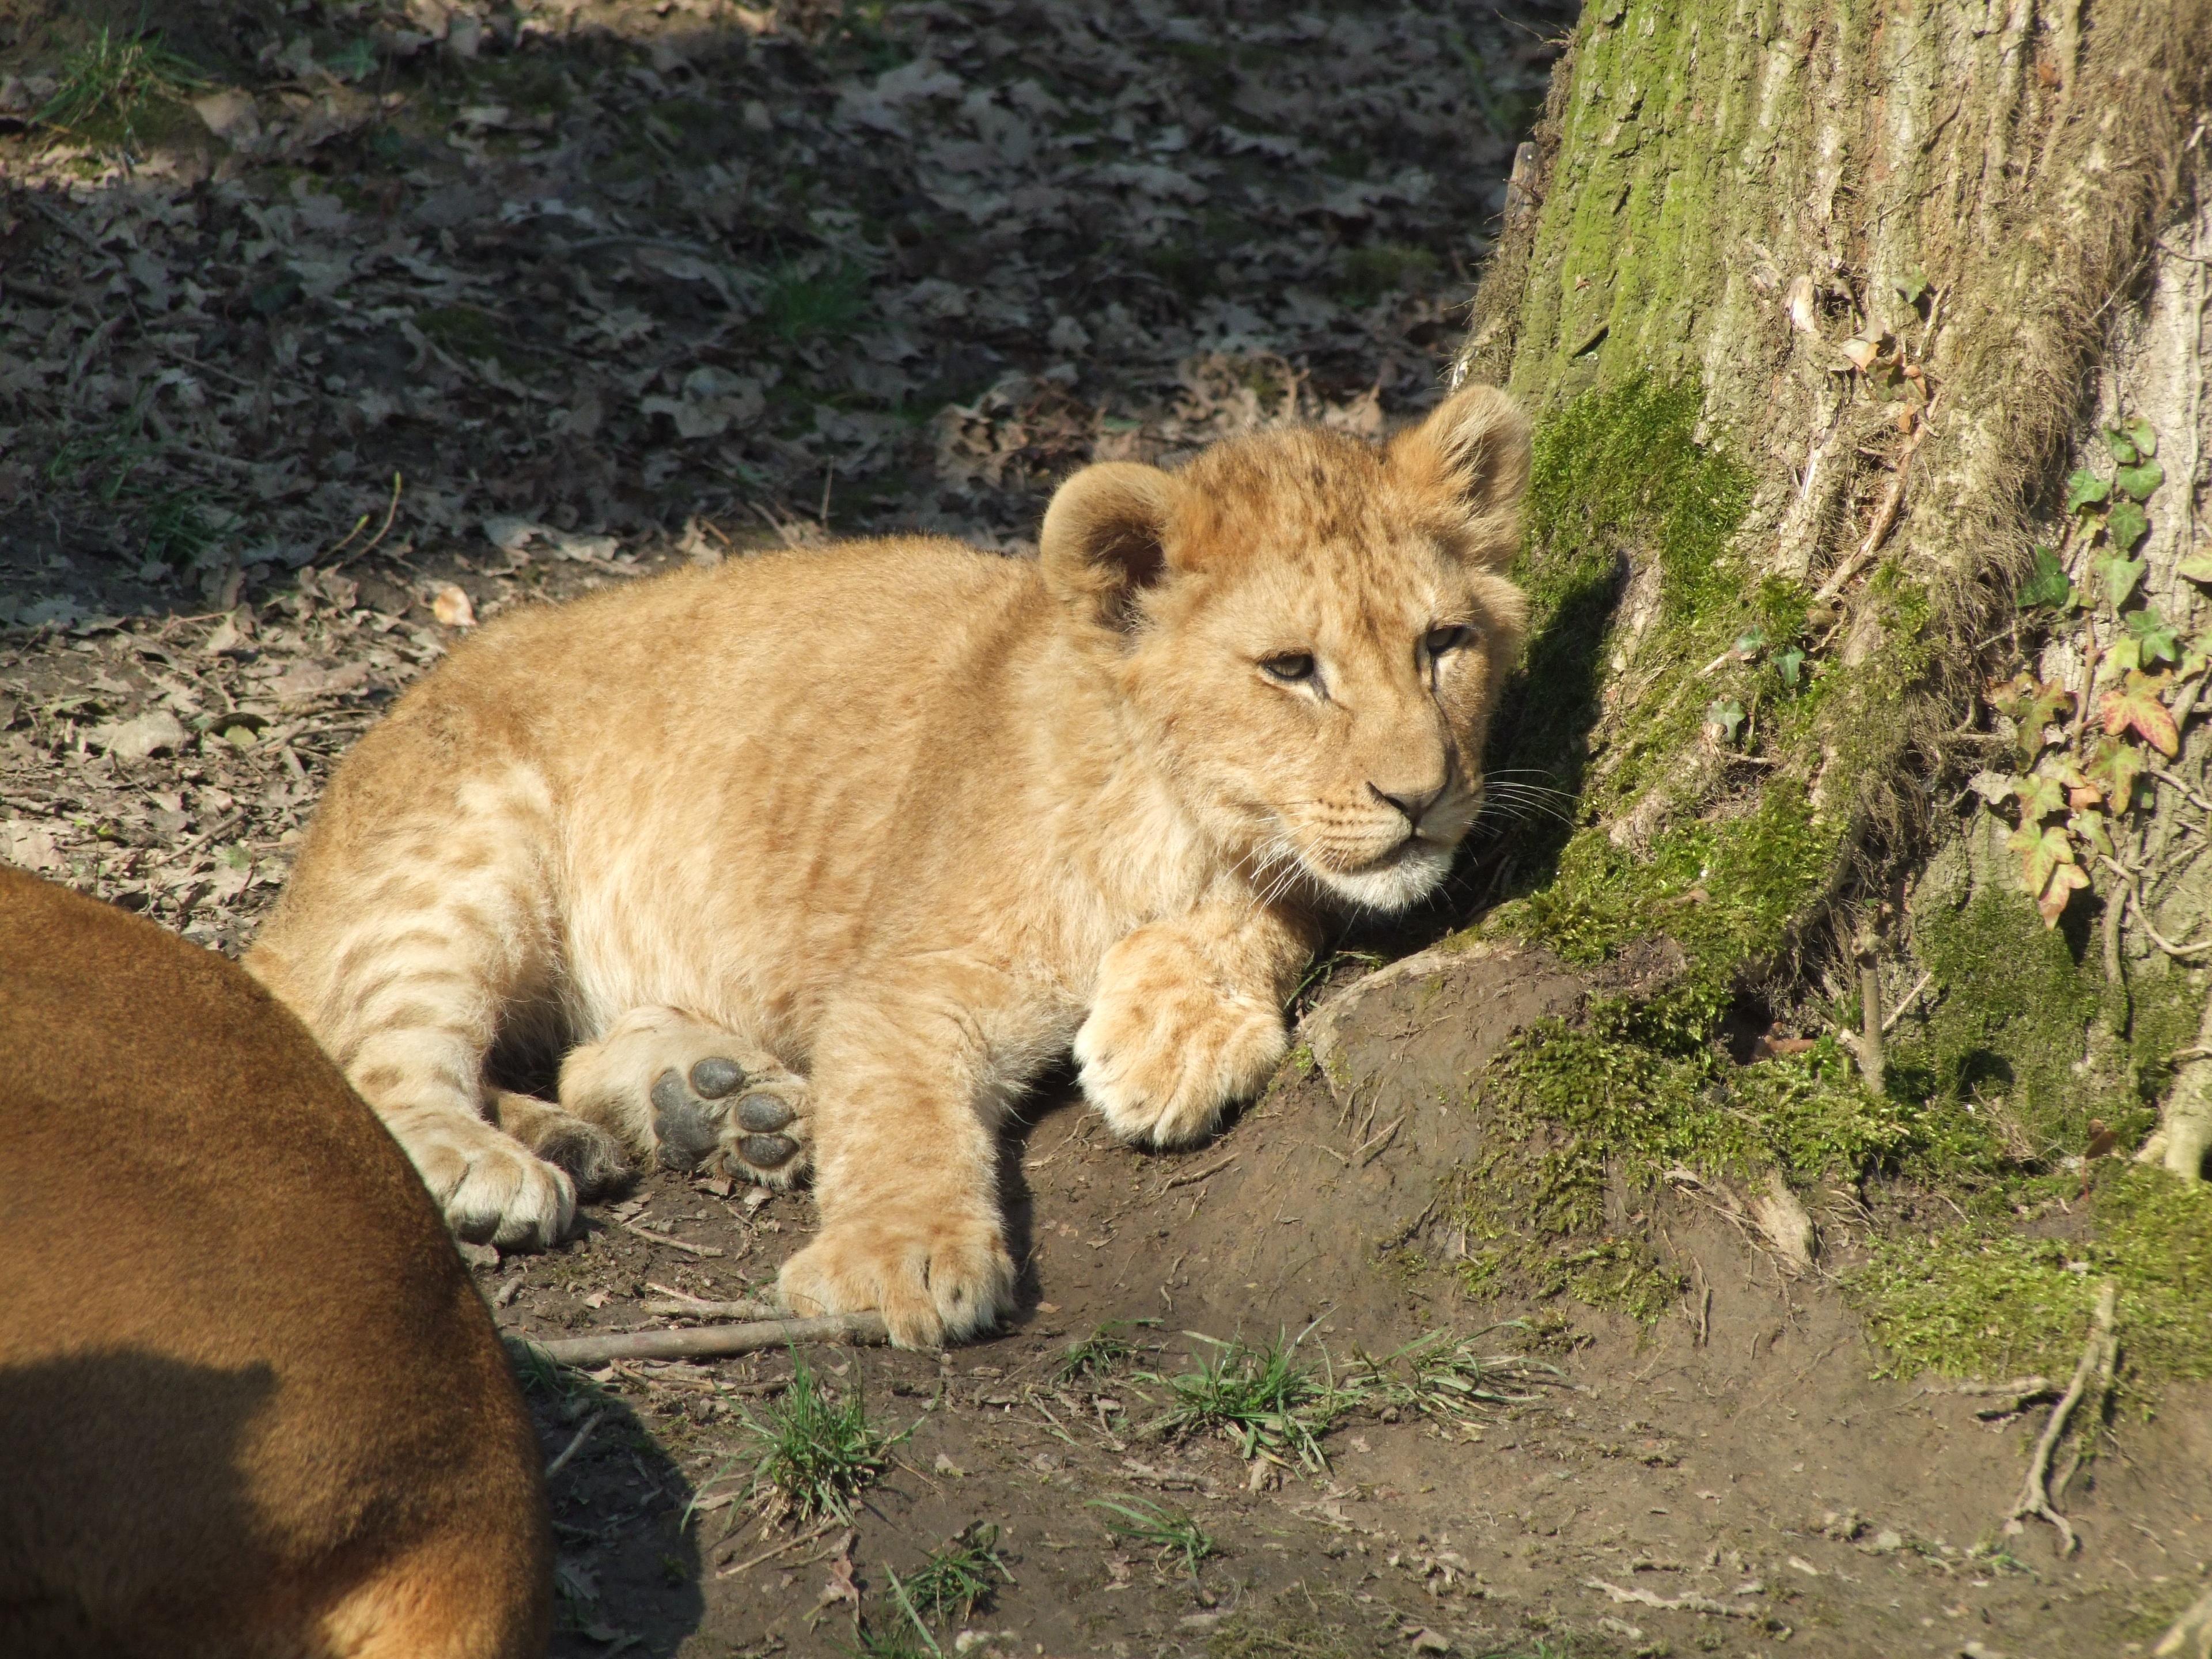 kostenlose foto natur sonne tierwelt zoo baby fauna l we faul tiere wirbeltier cub. Black Bedroom Furniture Sets. Home Design Ideas